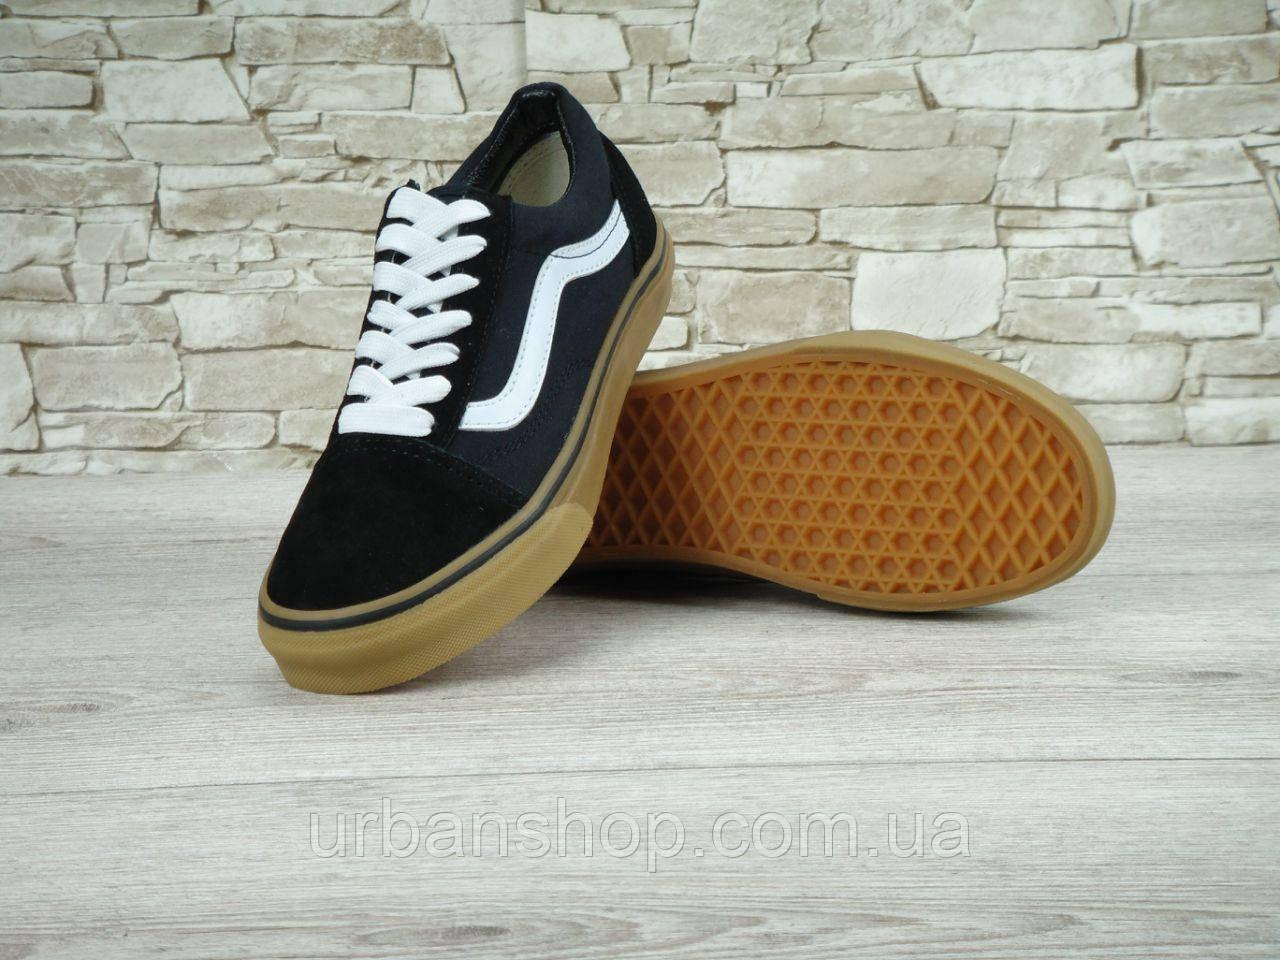 Купить Мужские кеды Vans Old Skool Black White Gum db5e410c11334